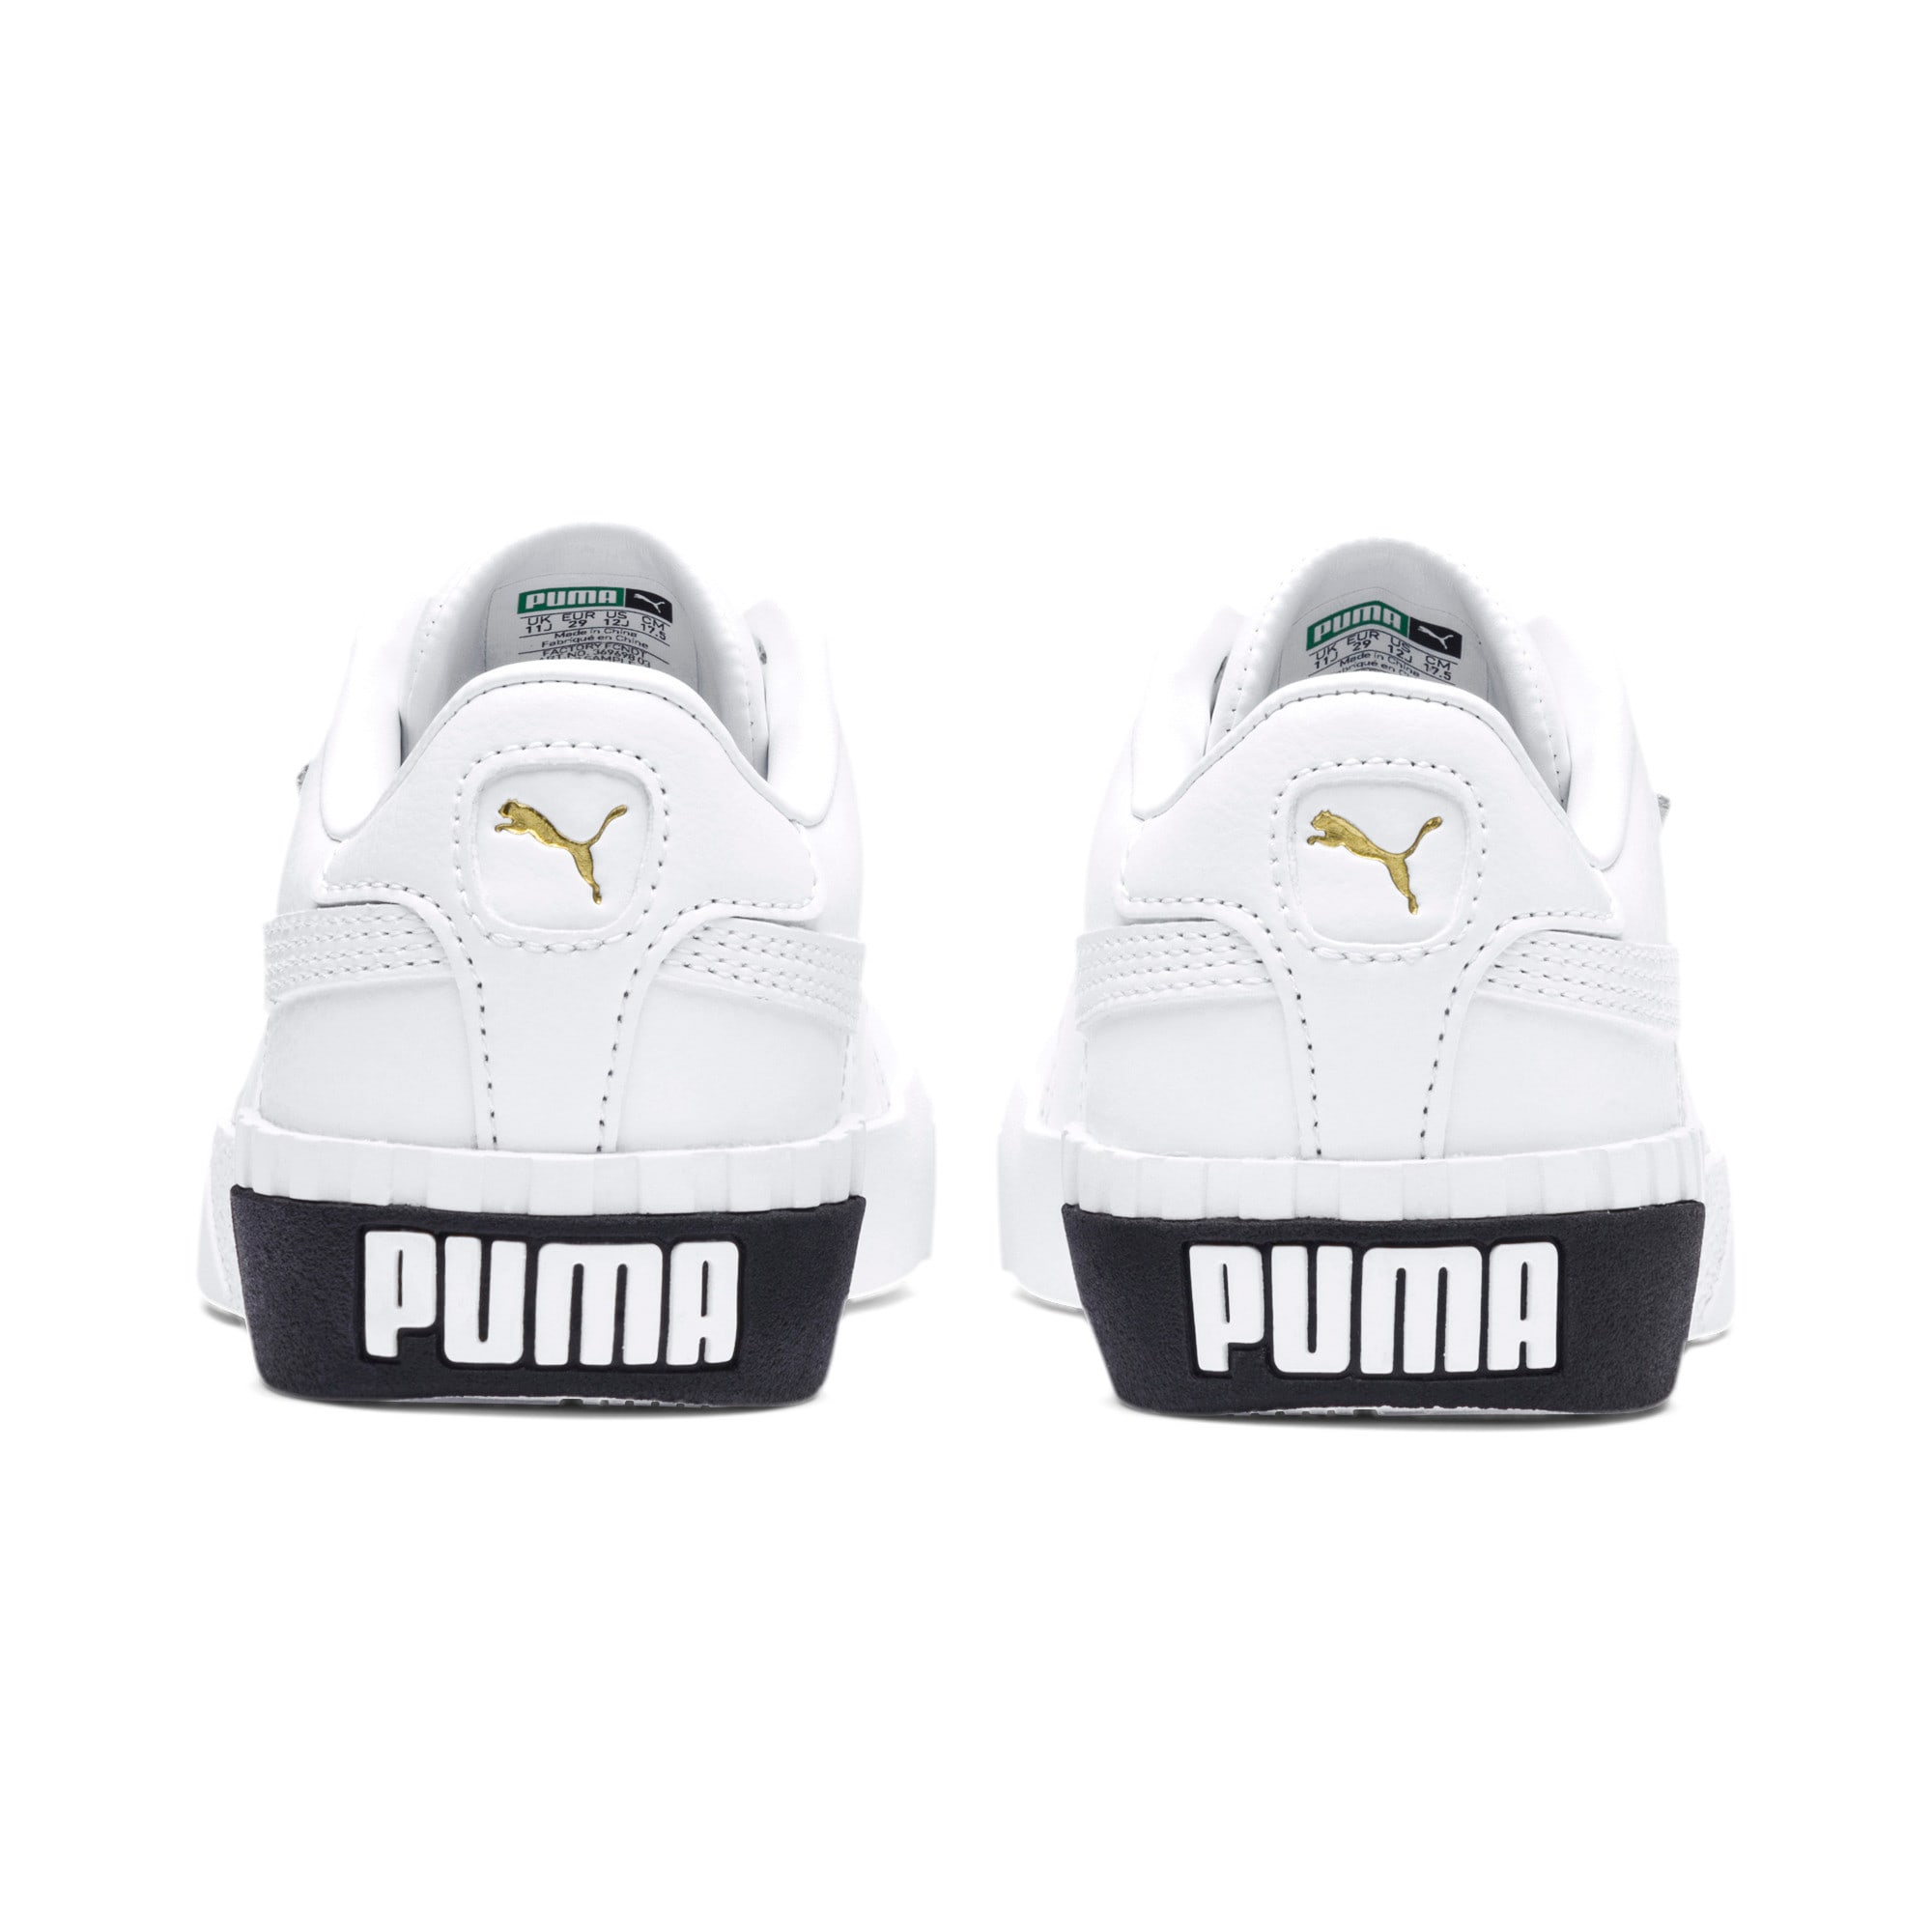 Thumbnail 3 of Cali Girls' Trainers, Puma White-Puma Black, medium